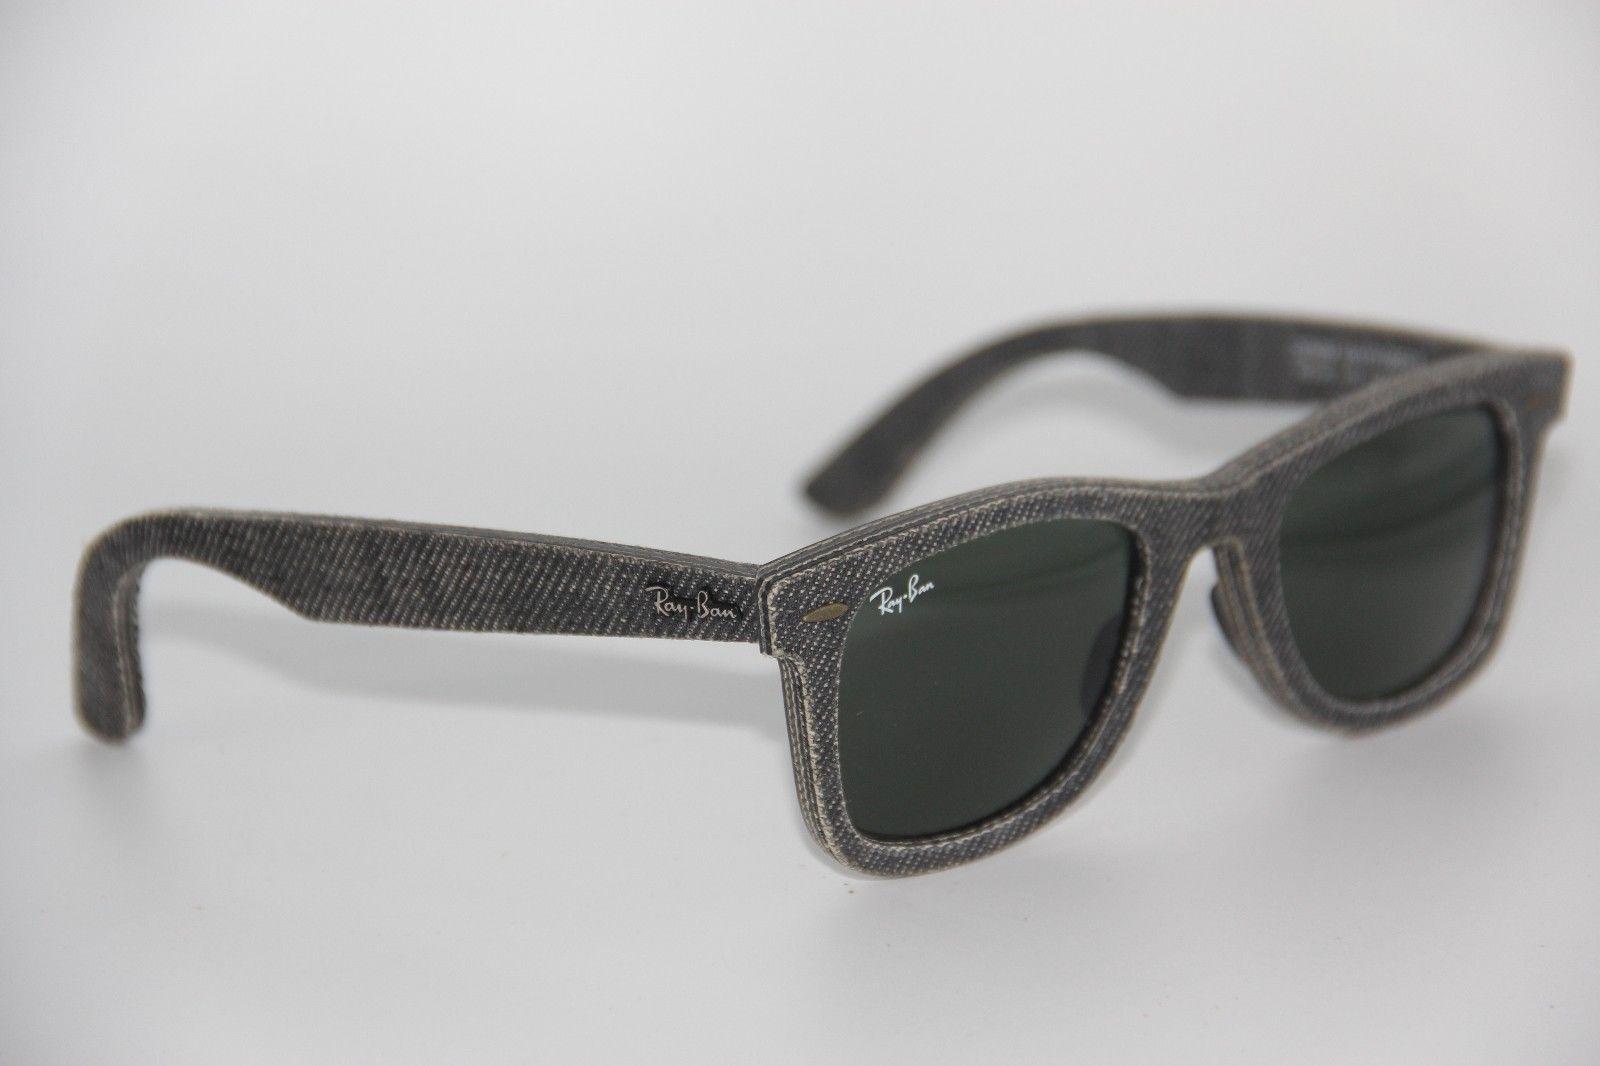 231b1fad5f Sunglasses Similar To Ray Bans « Heritage Malta